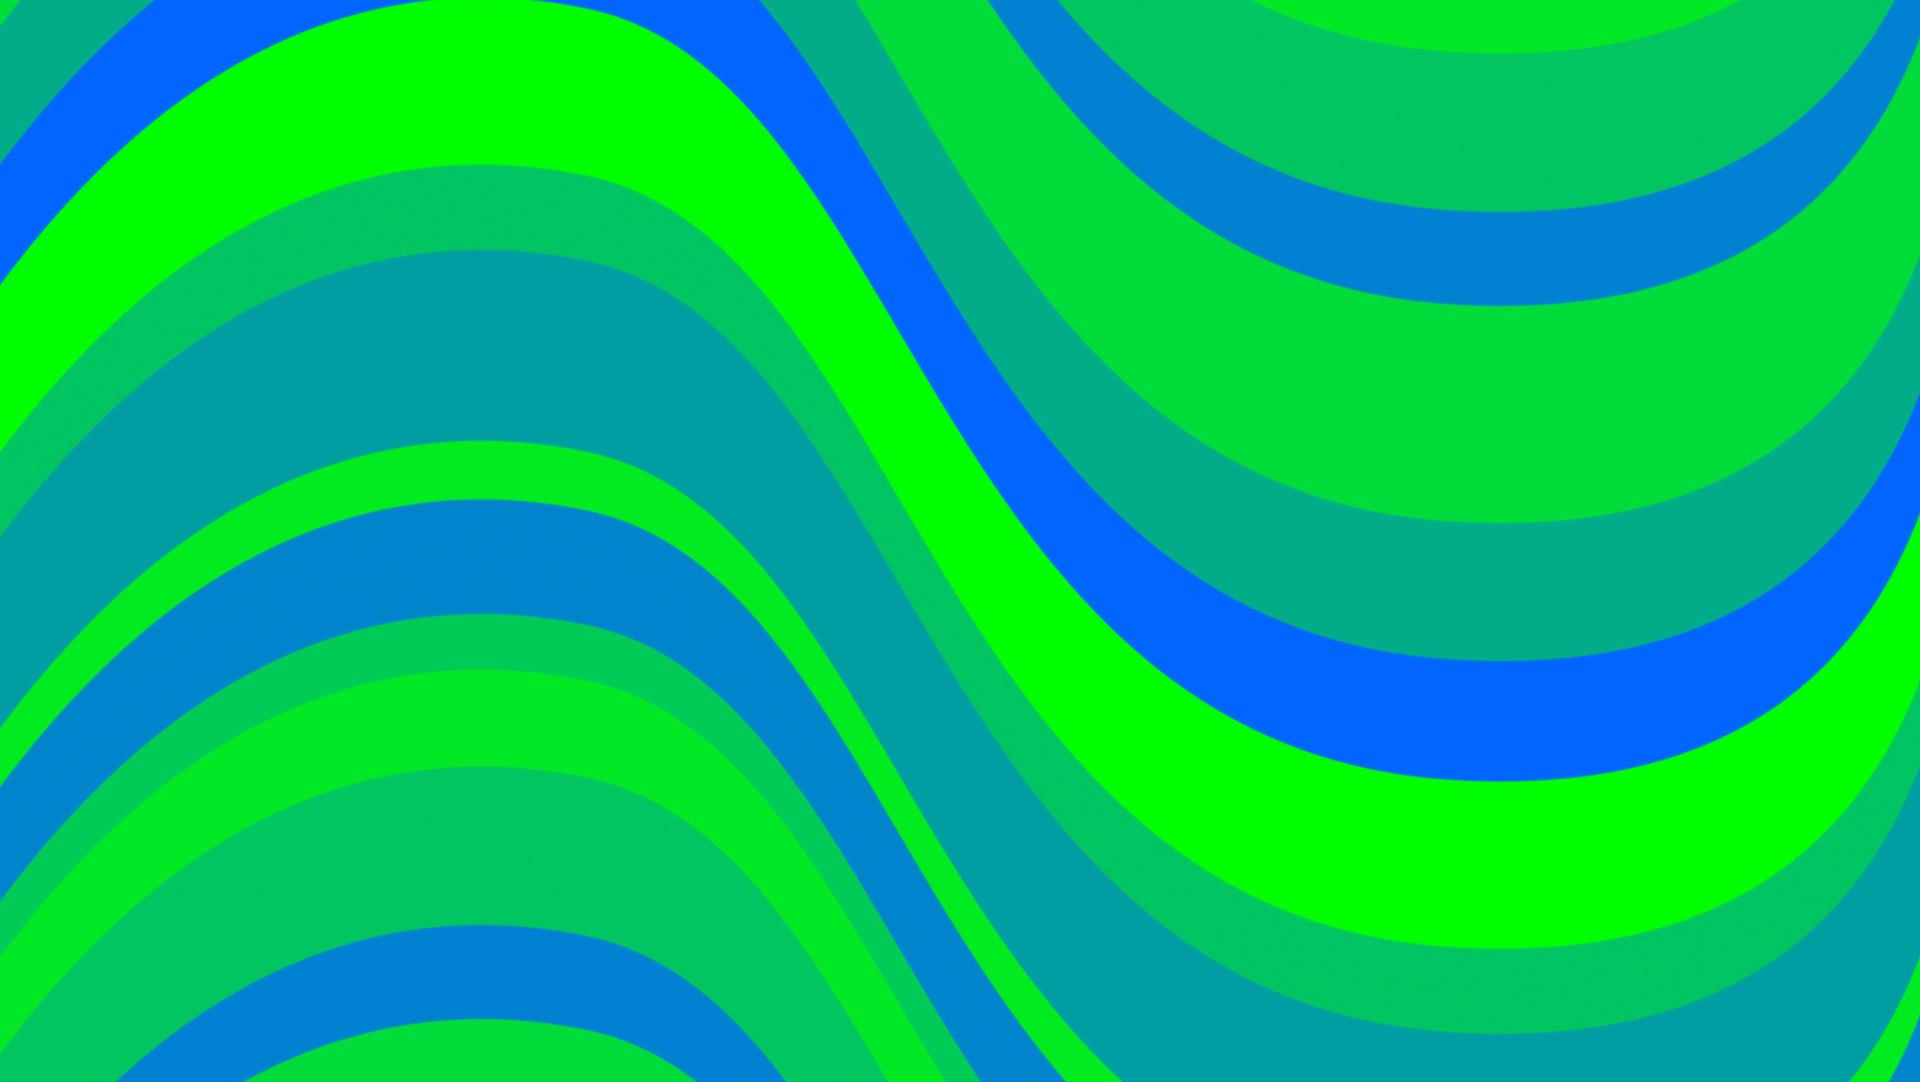 Blue  Green Background Free Stock Photo  Public Domain